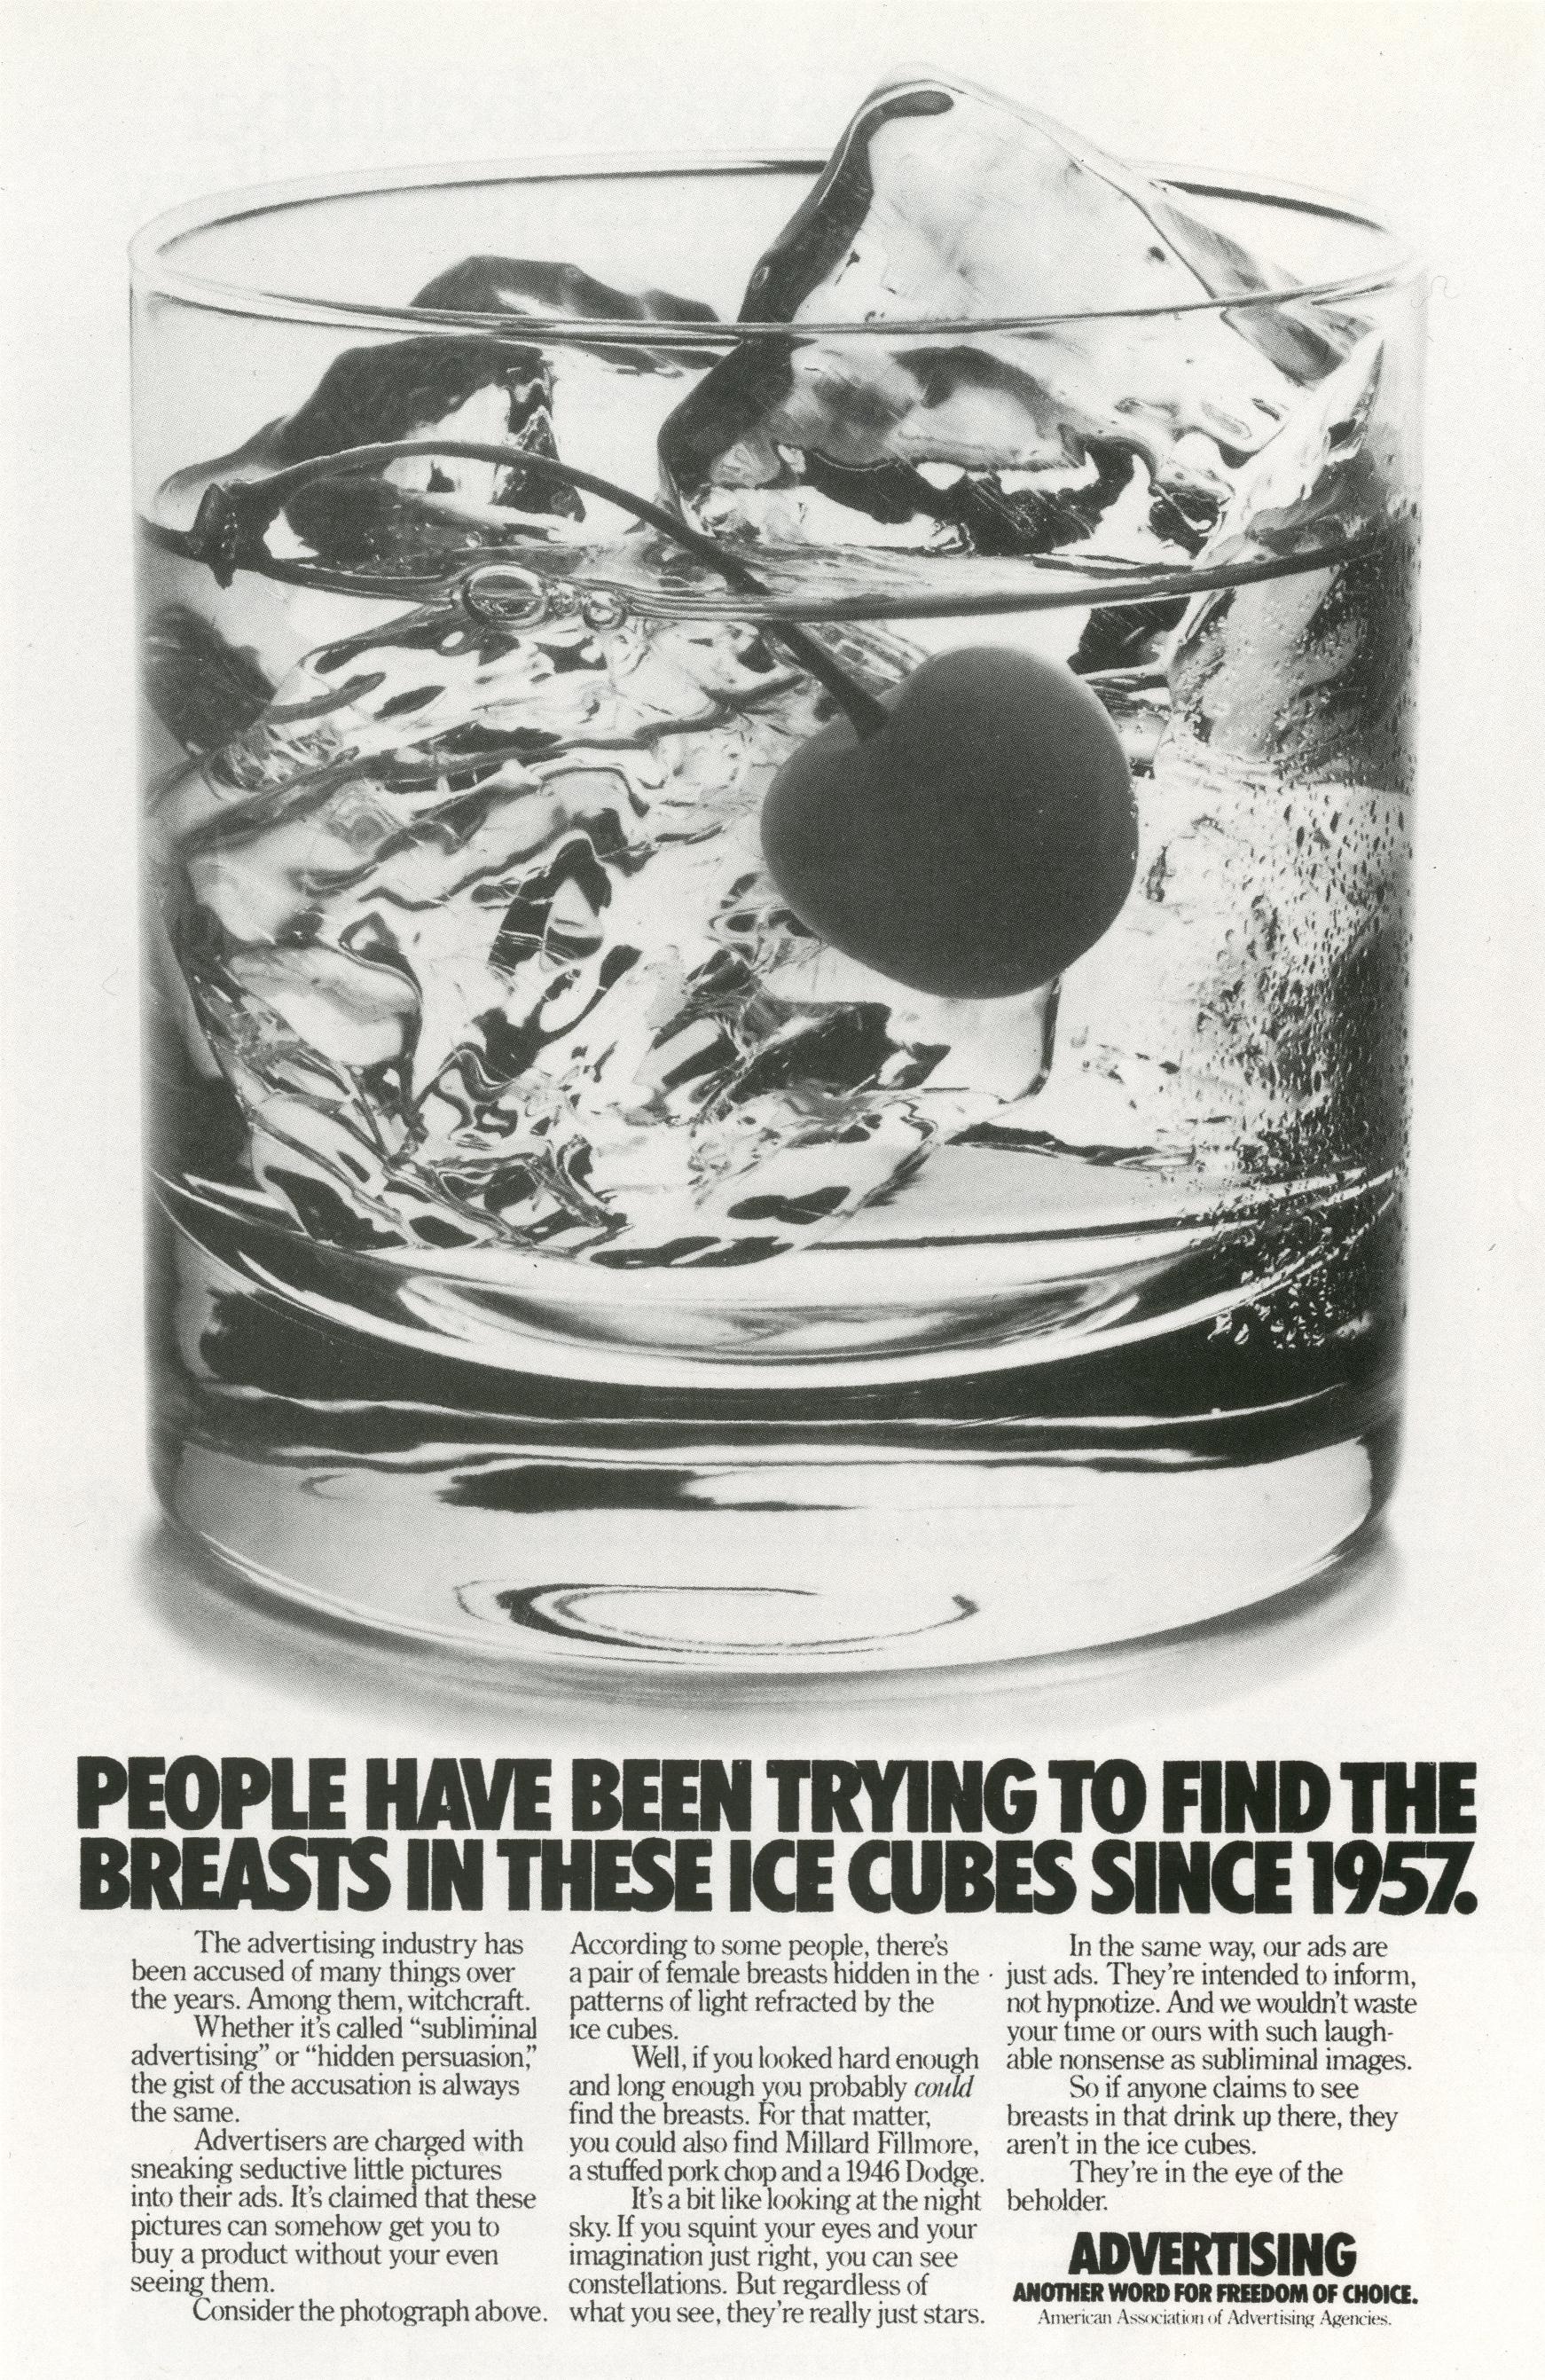 Fallon McElligott, Advertising, 'Icecubes'-01